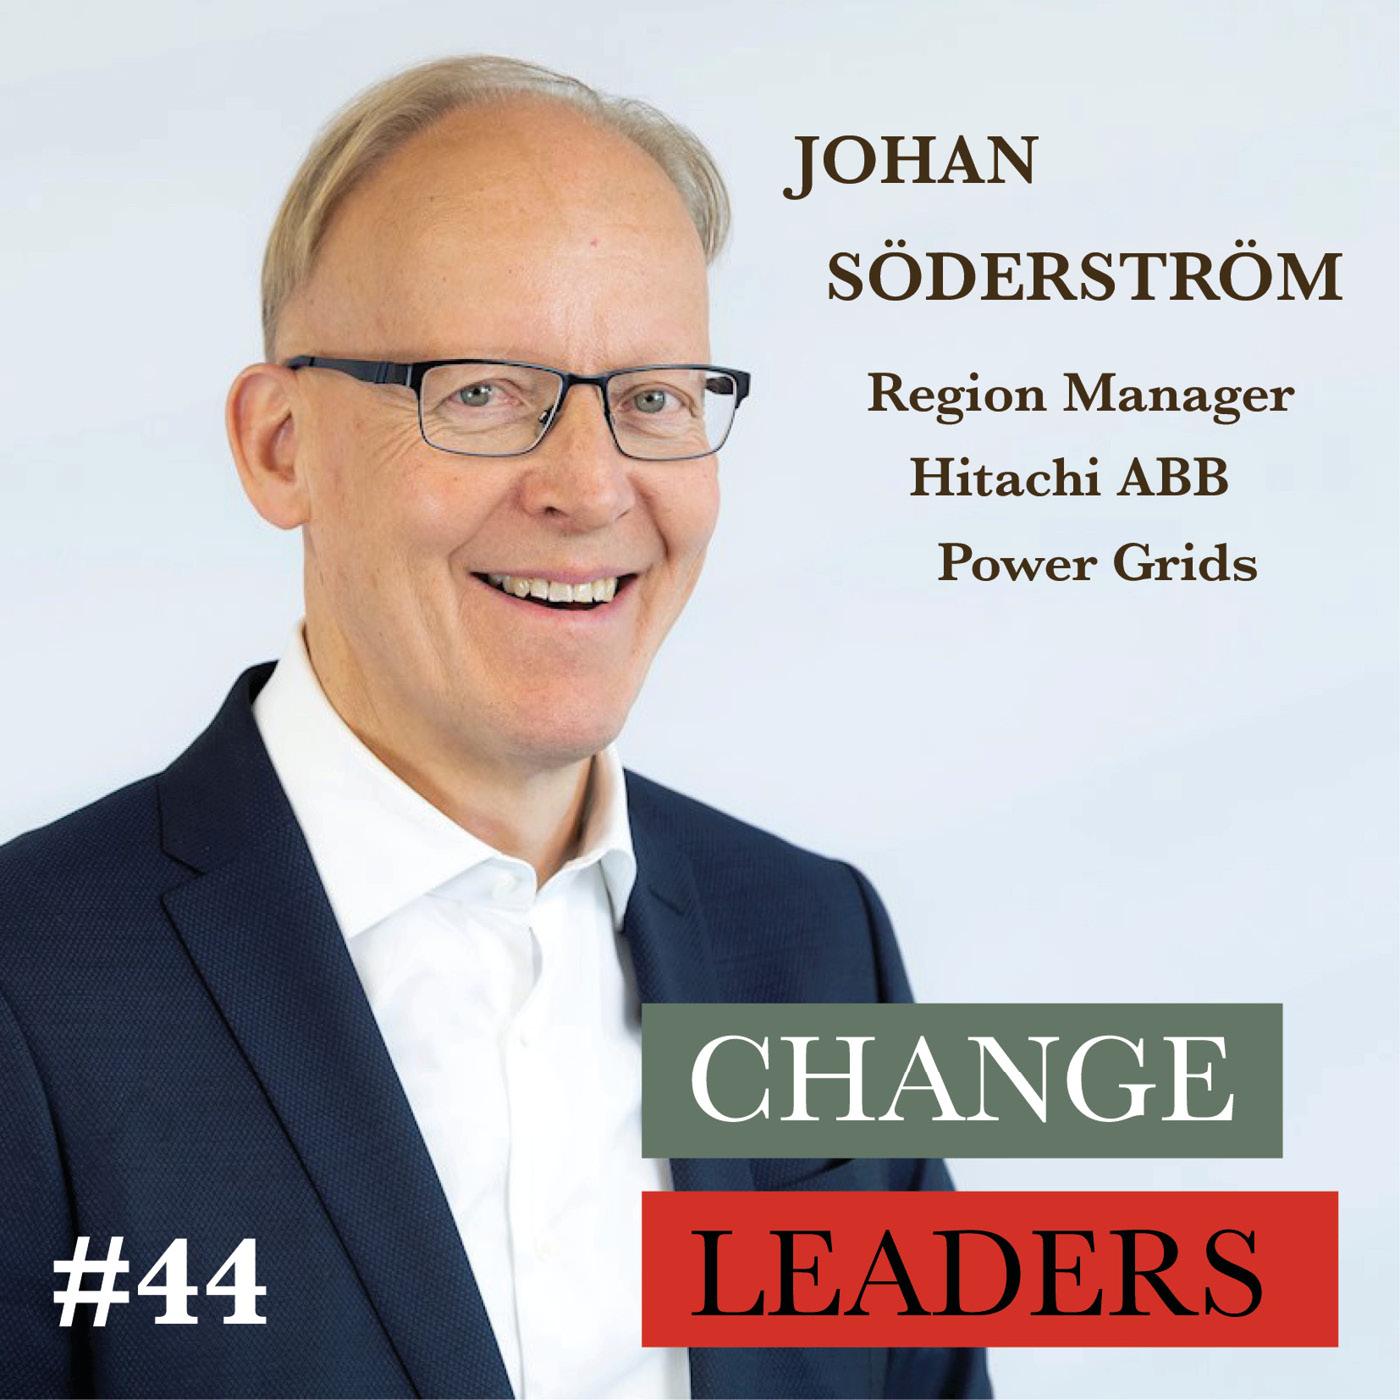 #44 Johan Söderström, Region Manager Hitachi ABB Power Grids - The secrets to keep developing at work